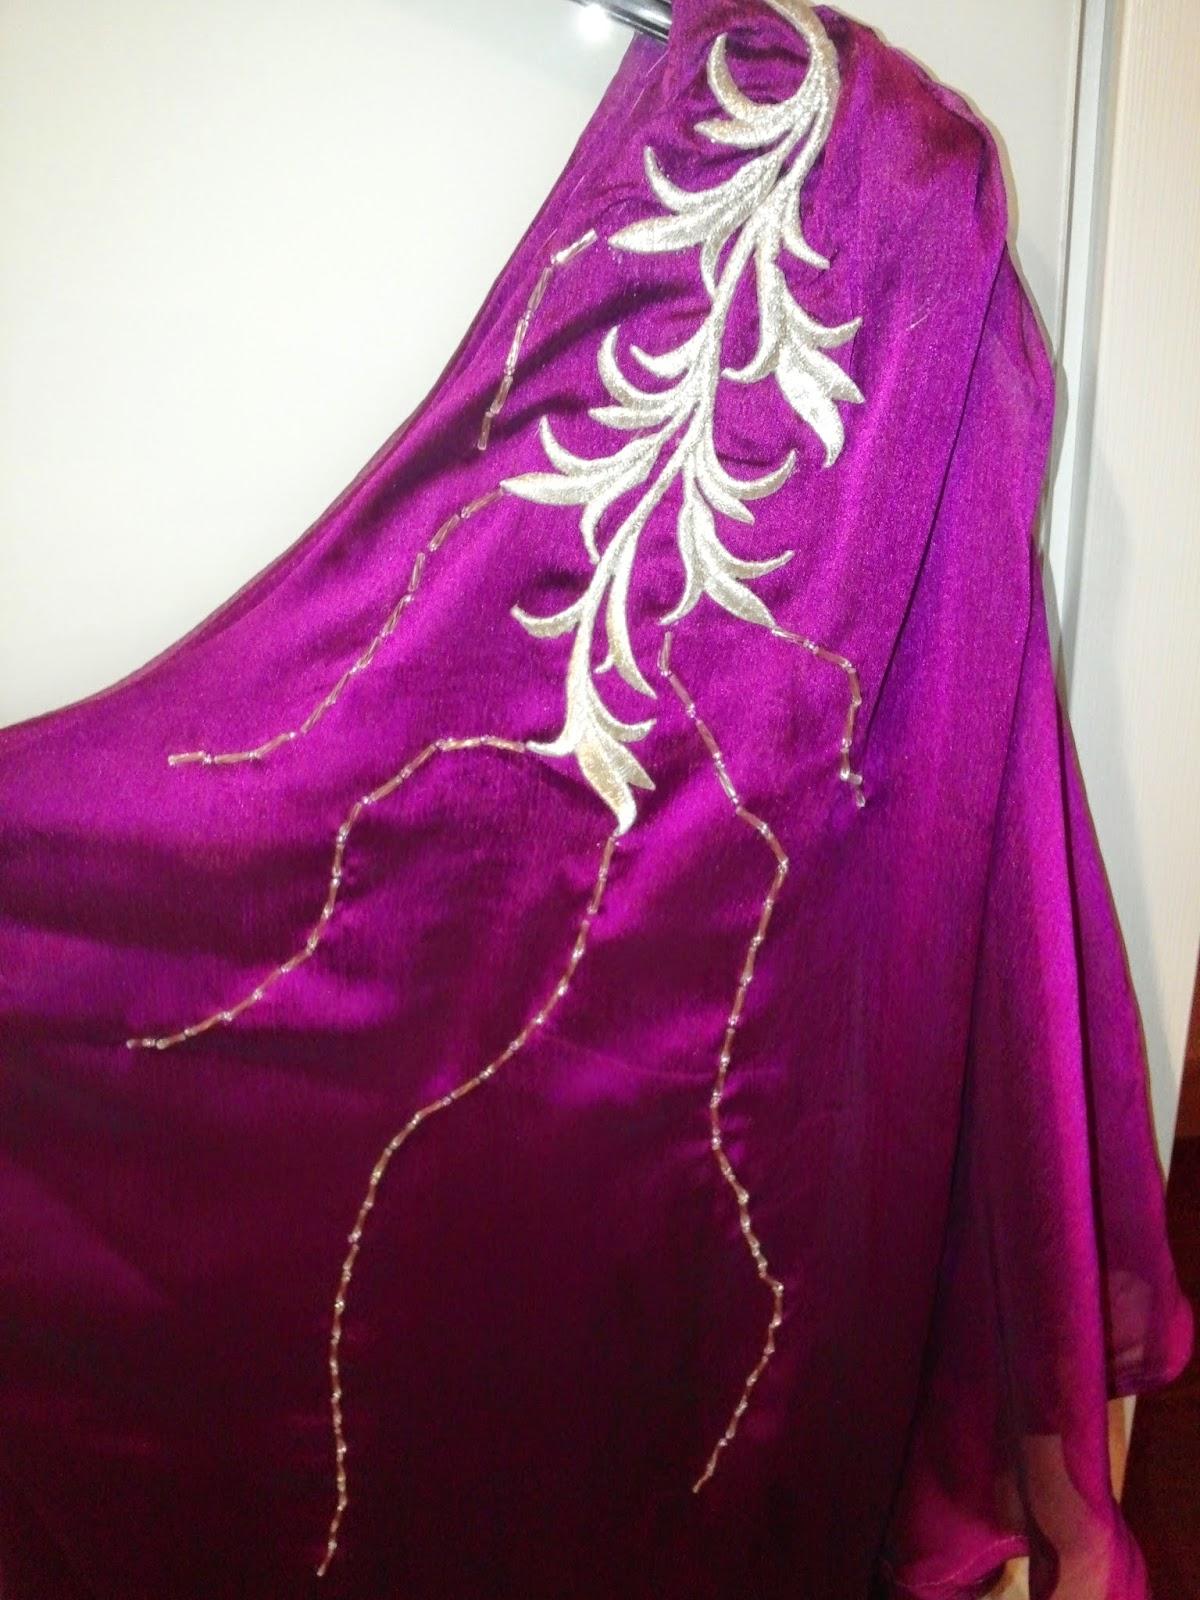 http://terzibegum.blogspot.com.tr/2014/10/tek-omuzlu-mor-elbise-burda-201401-112.html